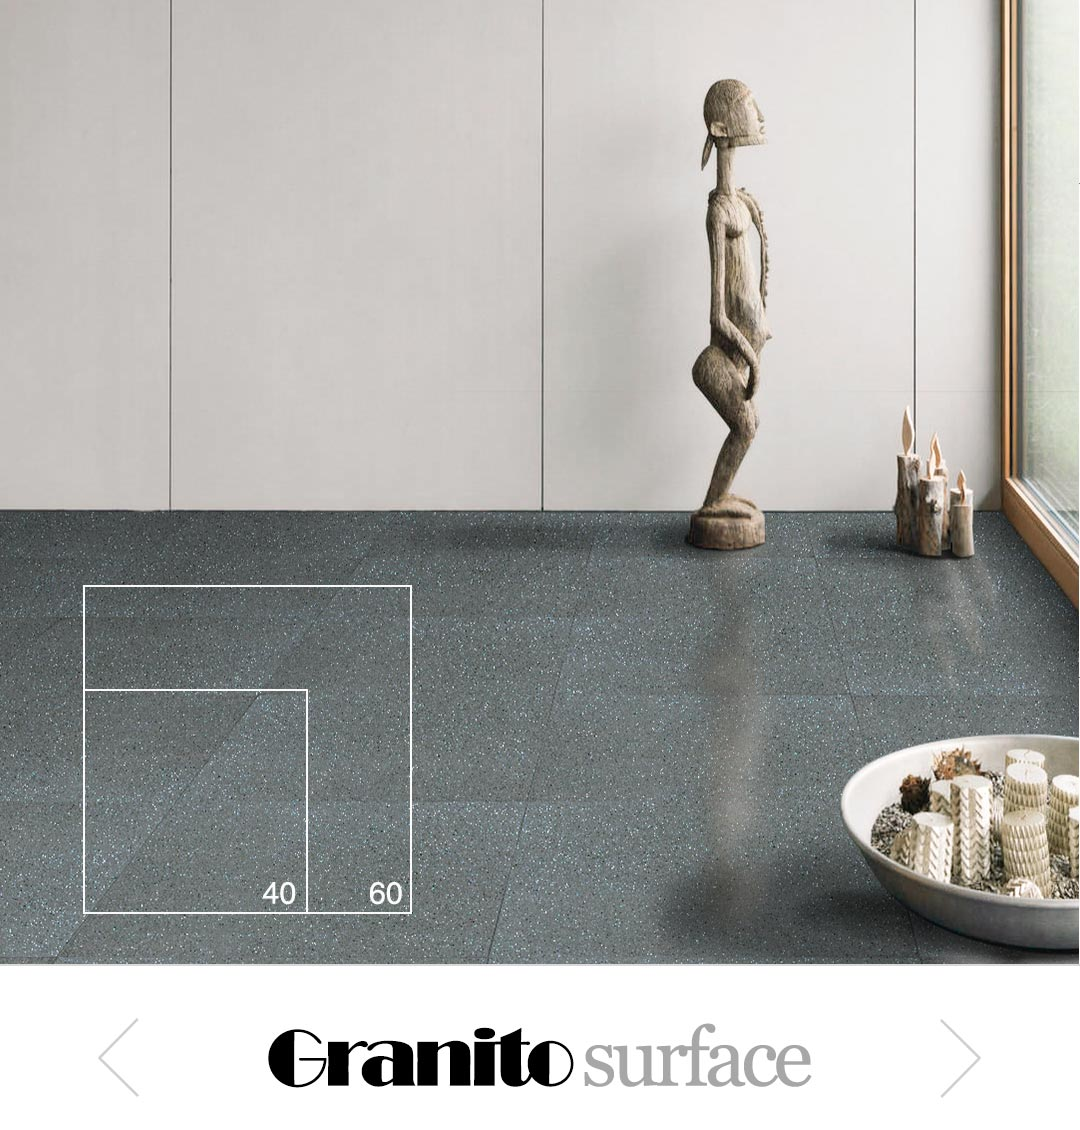 >Granito oppervlak